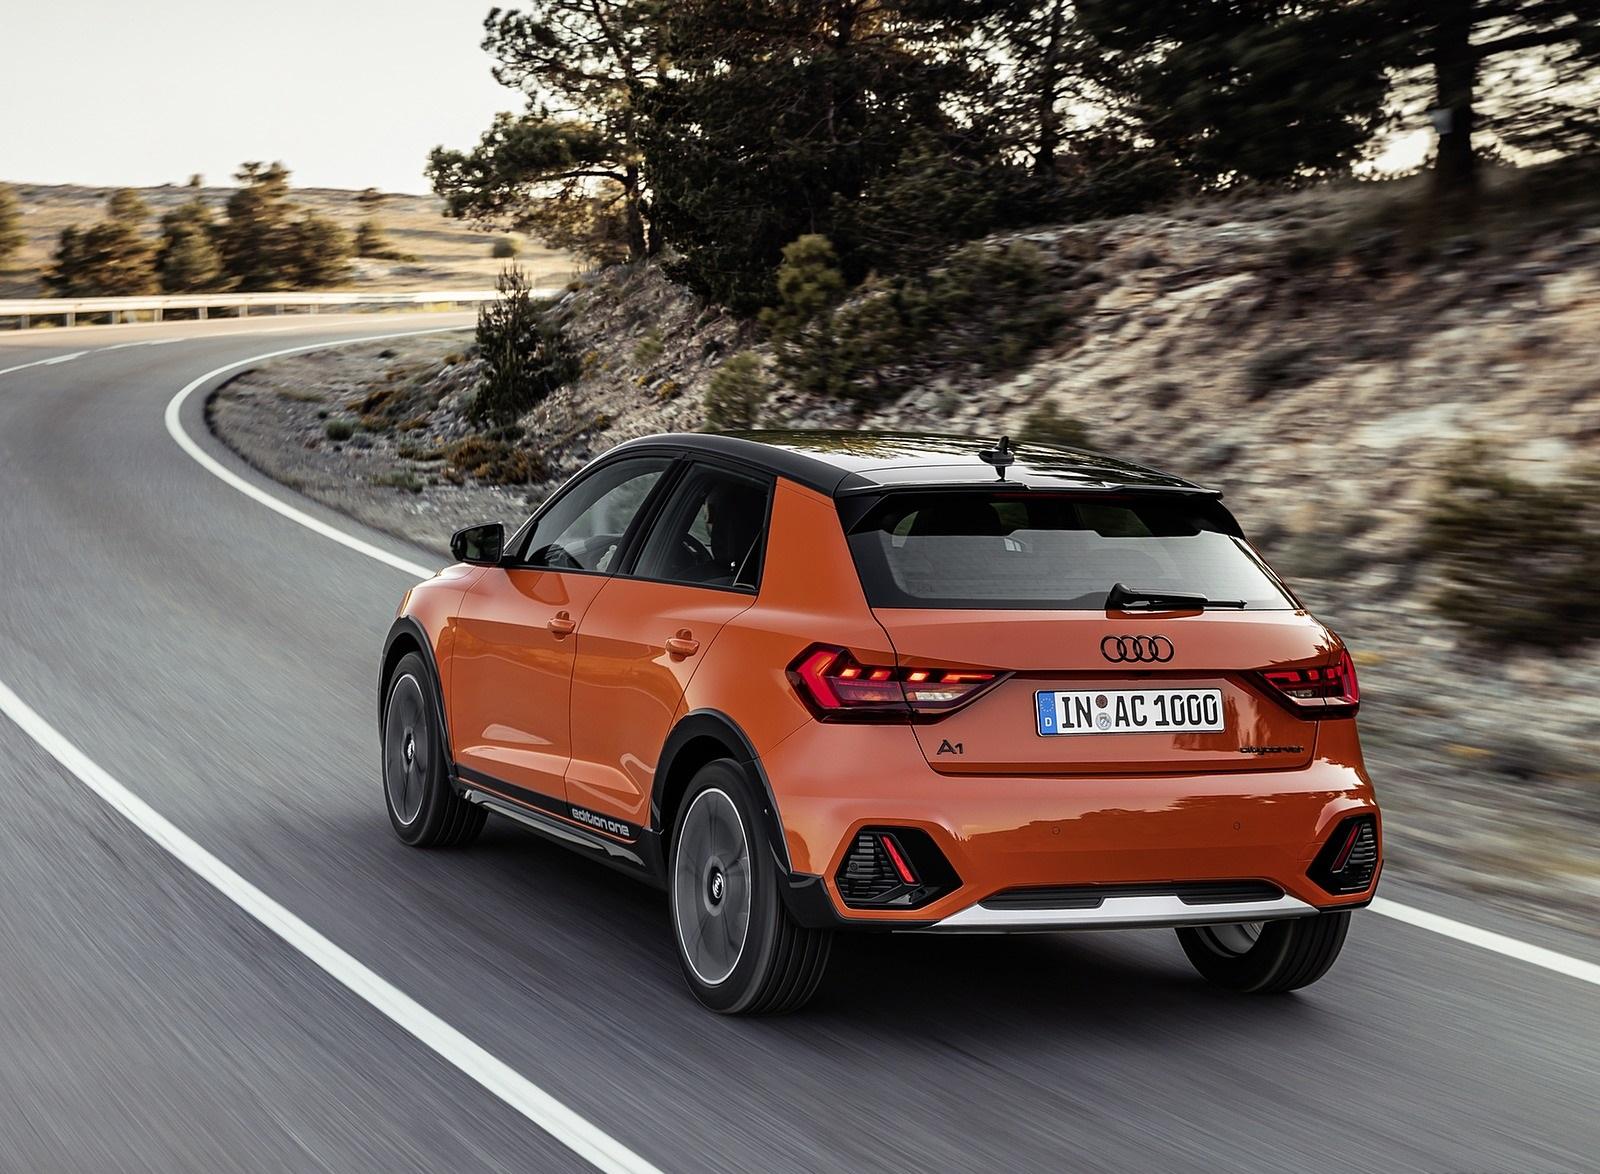 2020 Audi A1 Citycarver (Color: Pulse Orange) Rear Three-Quarter Wallpapers (5)